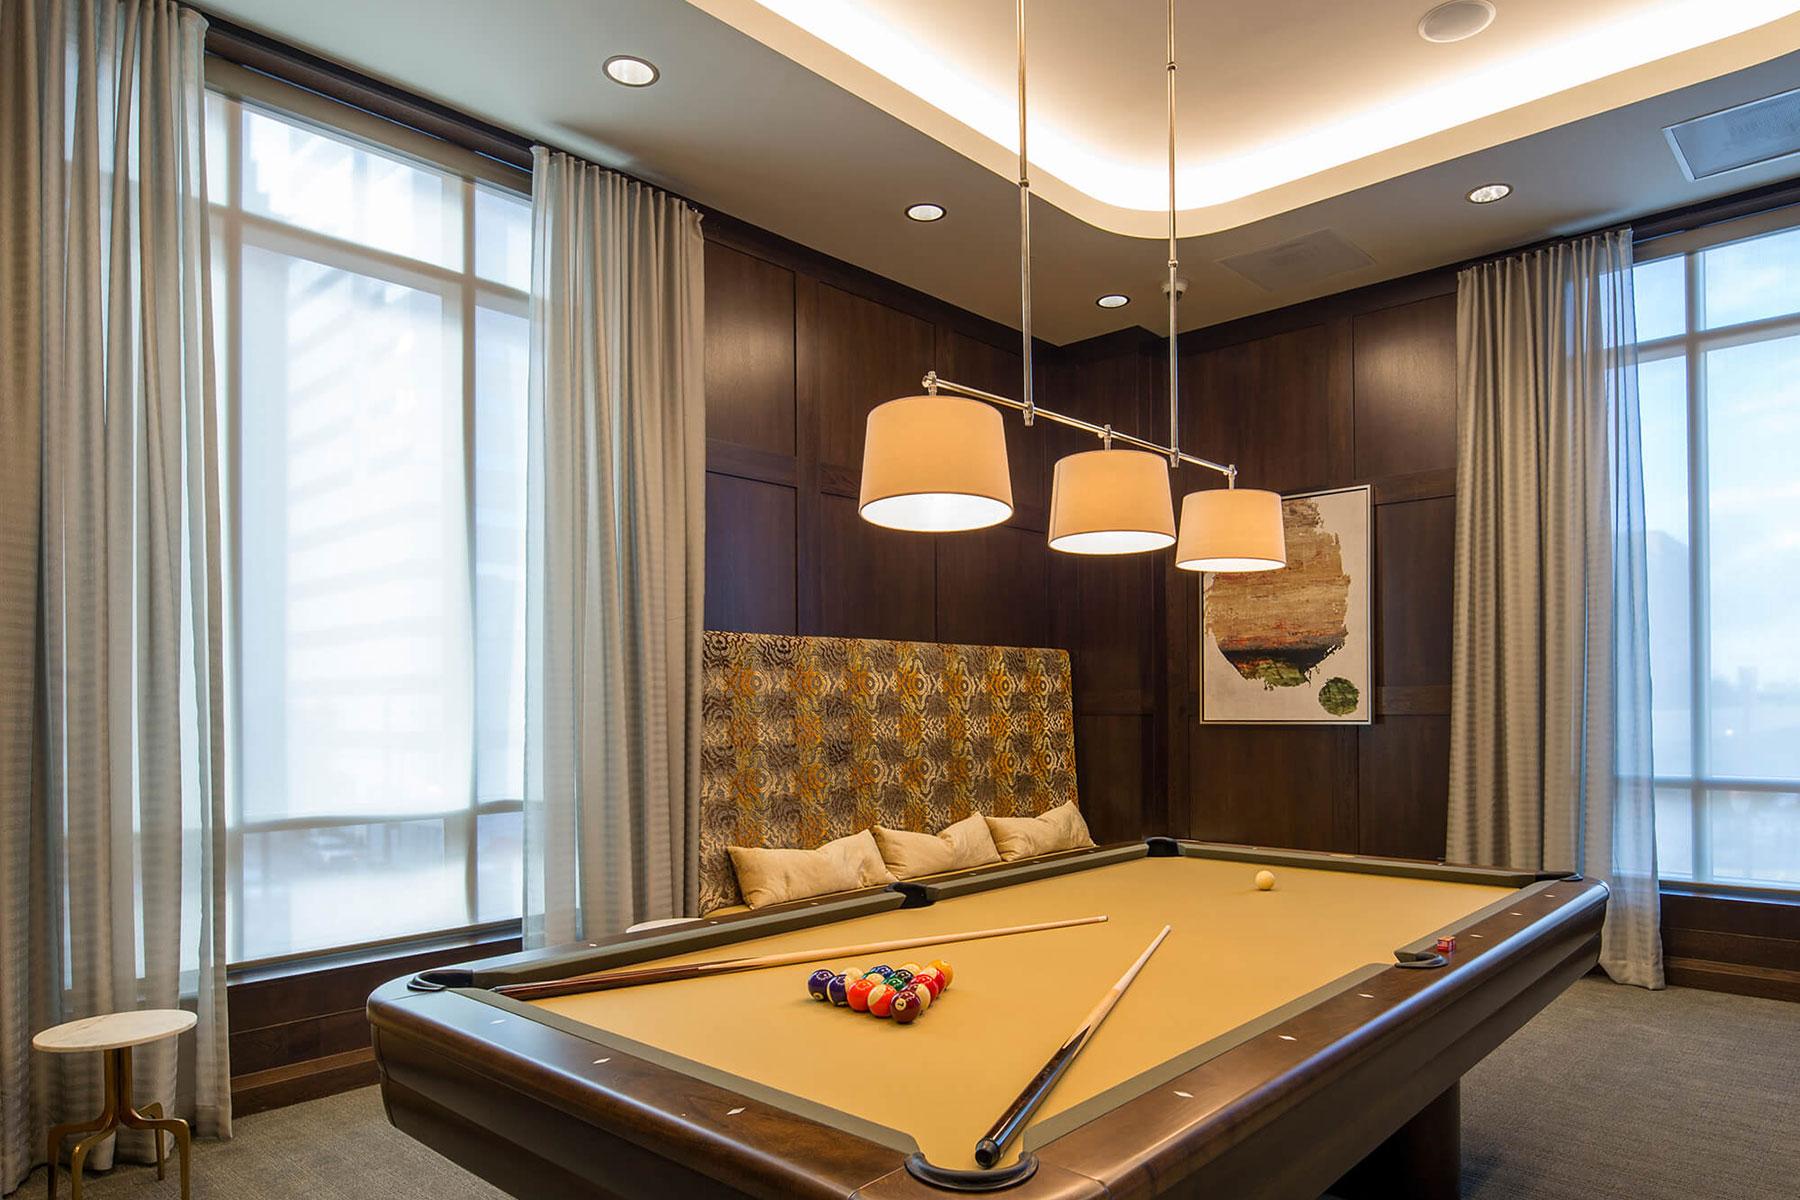 Market Square Tower Billiards Room